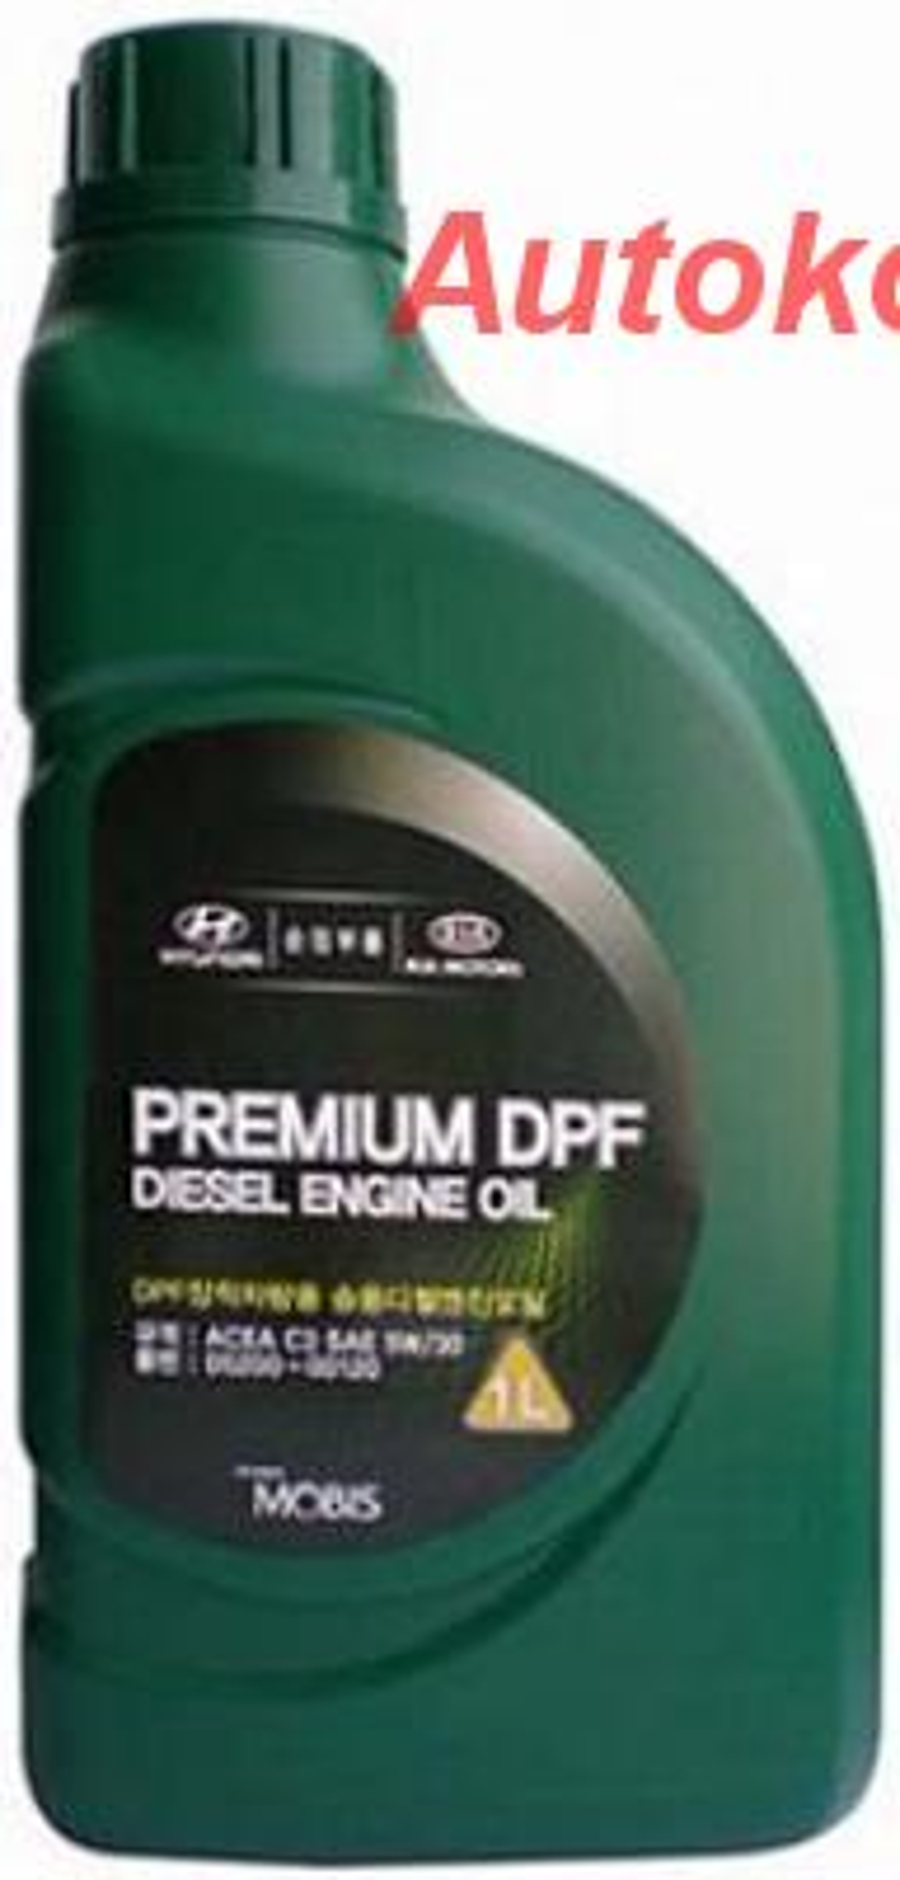 Масло моторное синтетическое Premium DPF Diesel 5W-30, 1л